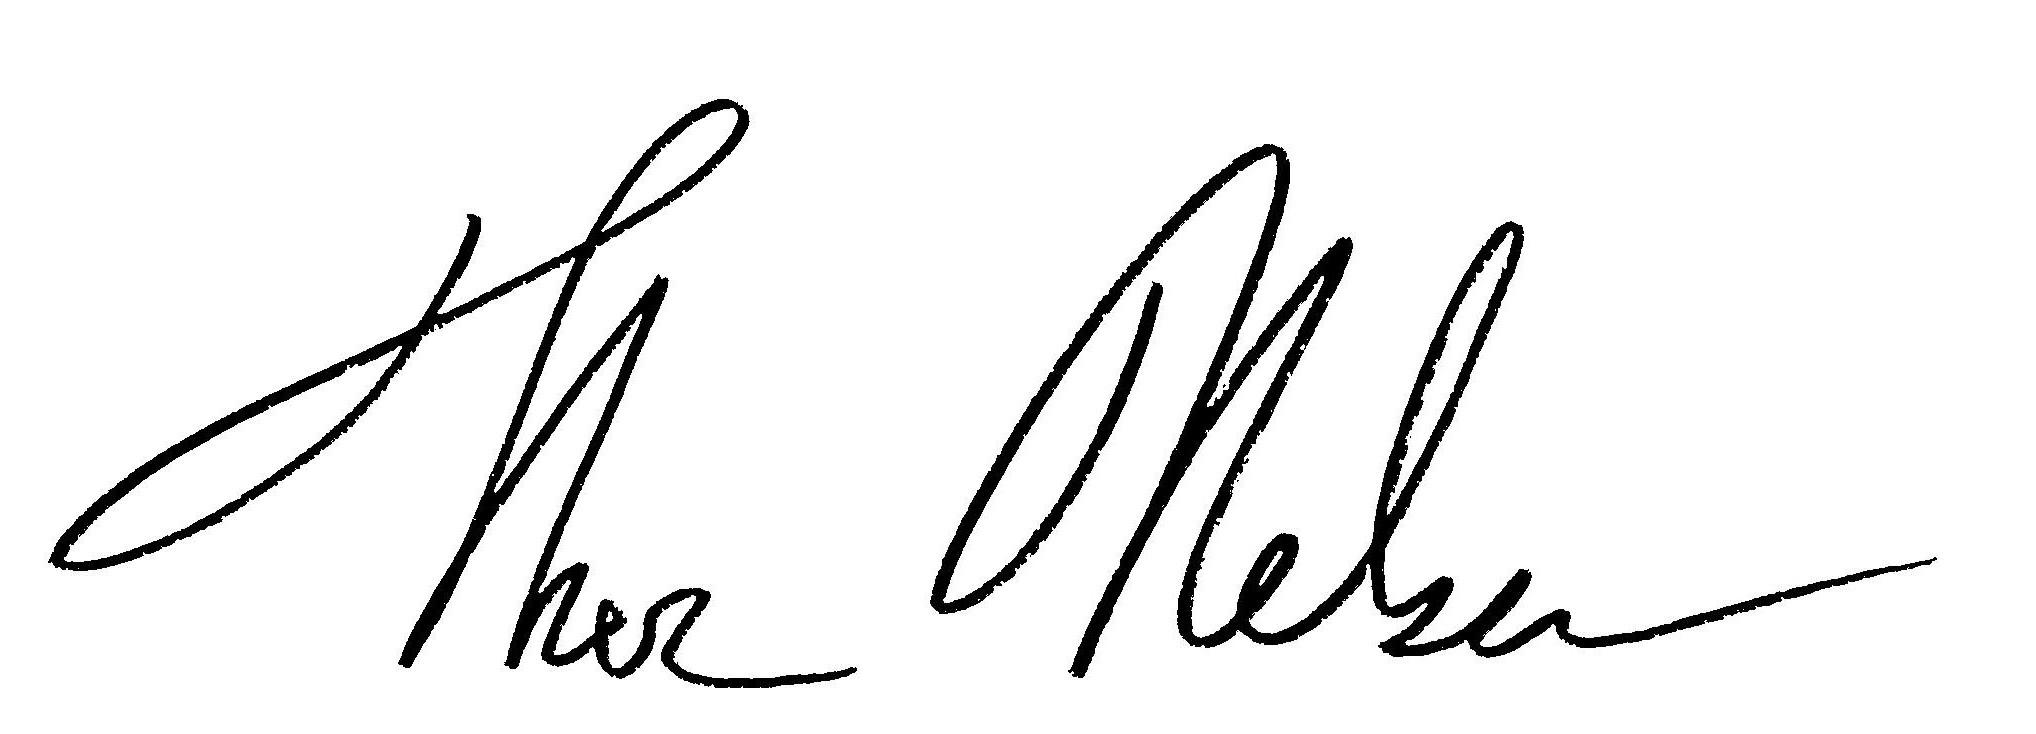 Thor Nelson signature